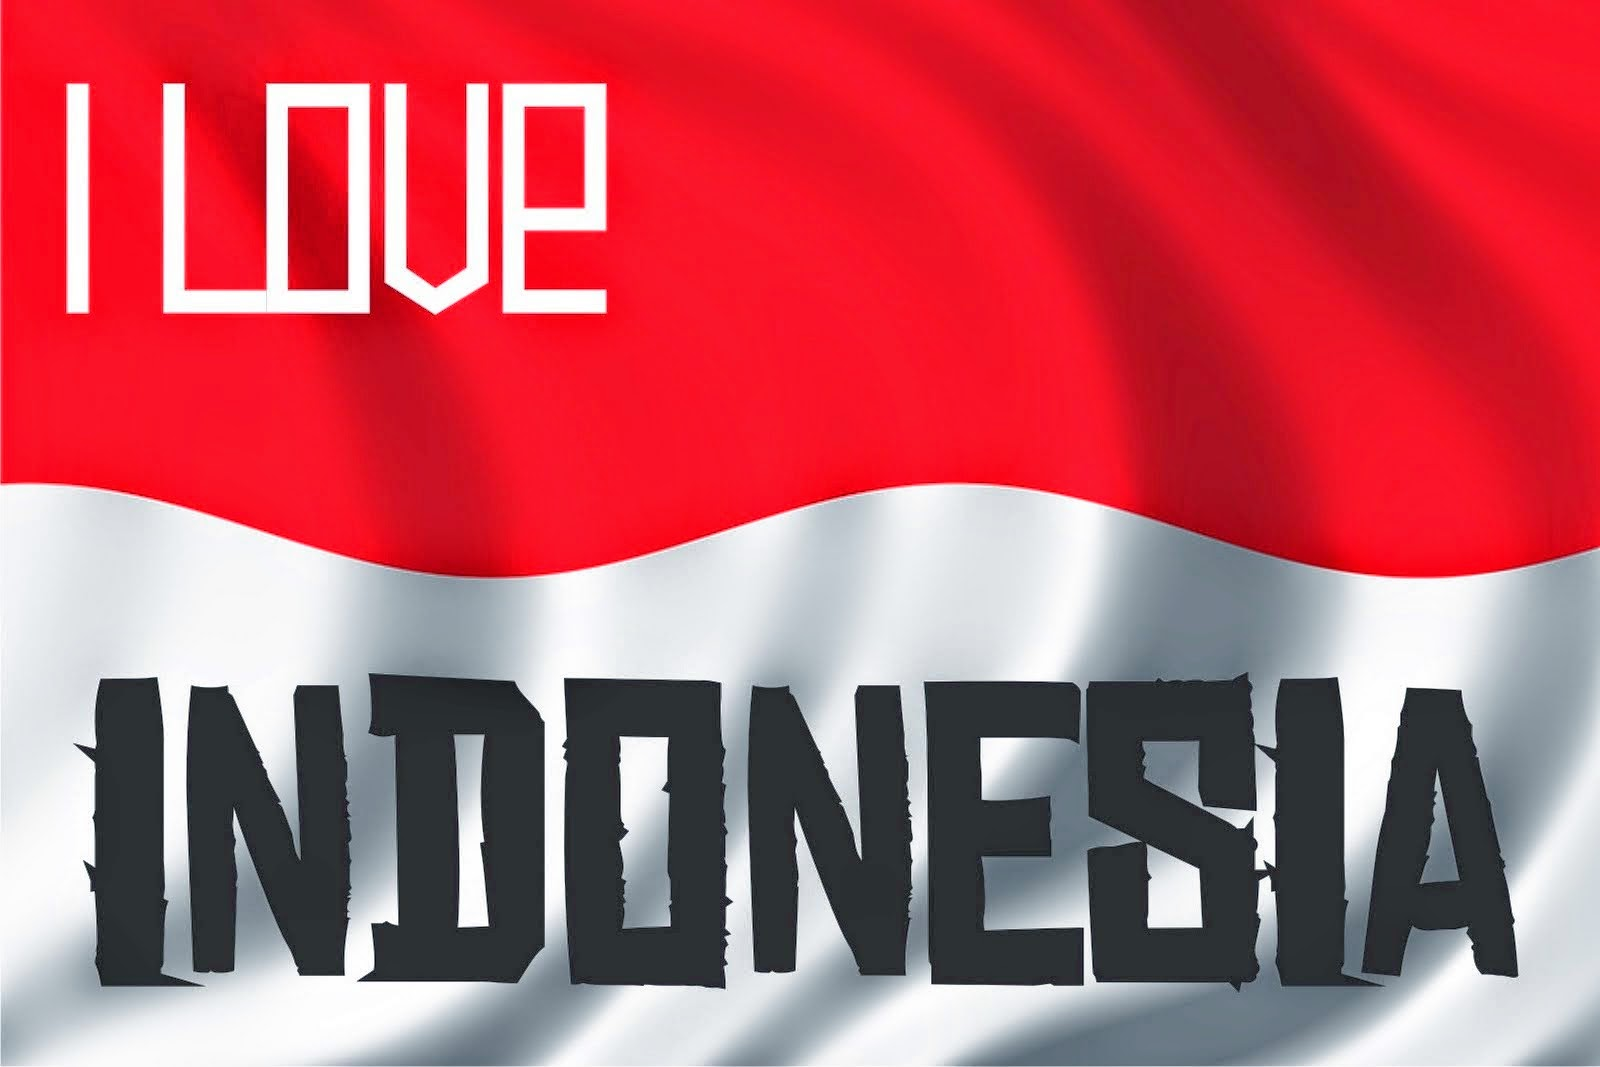 Ssh Lokal Indonesia 9 juni 2014